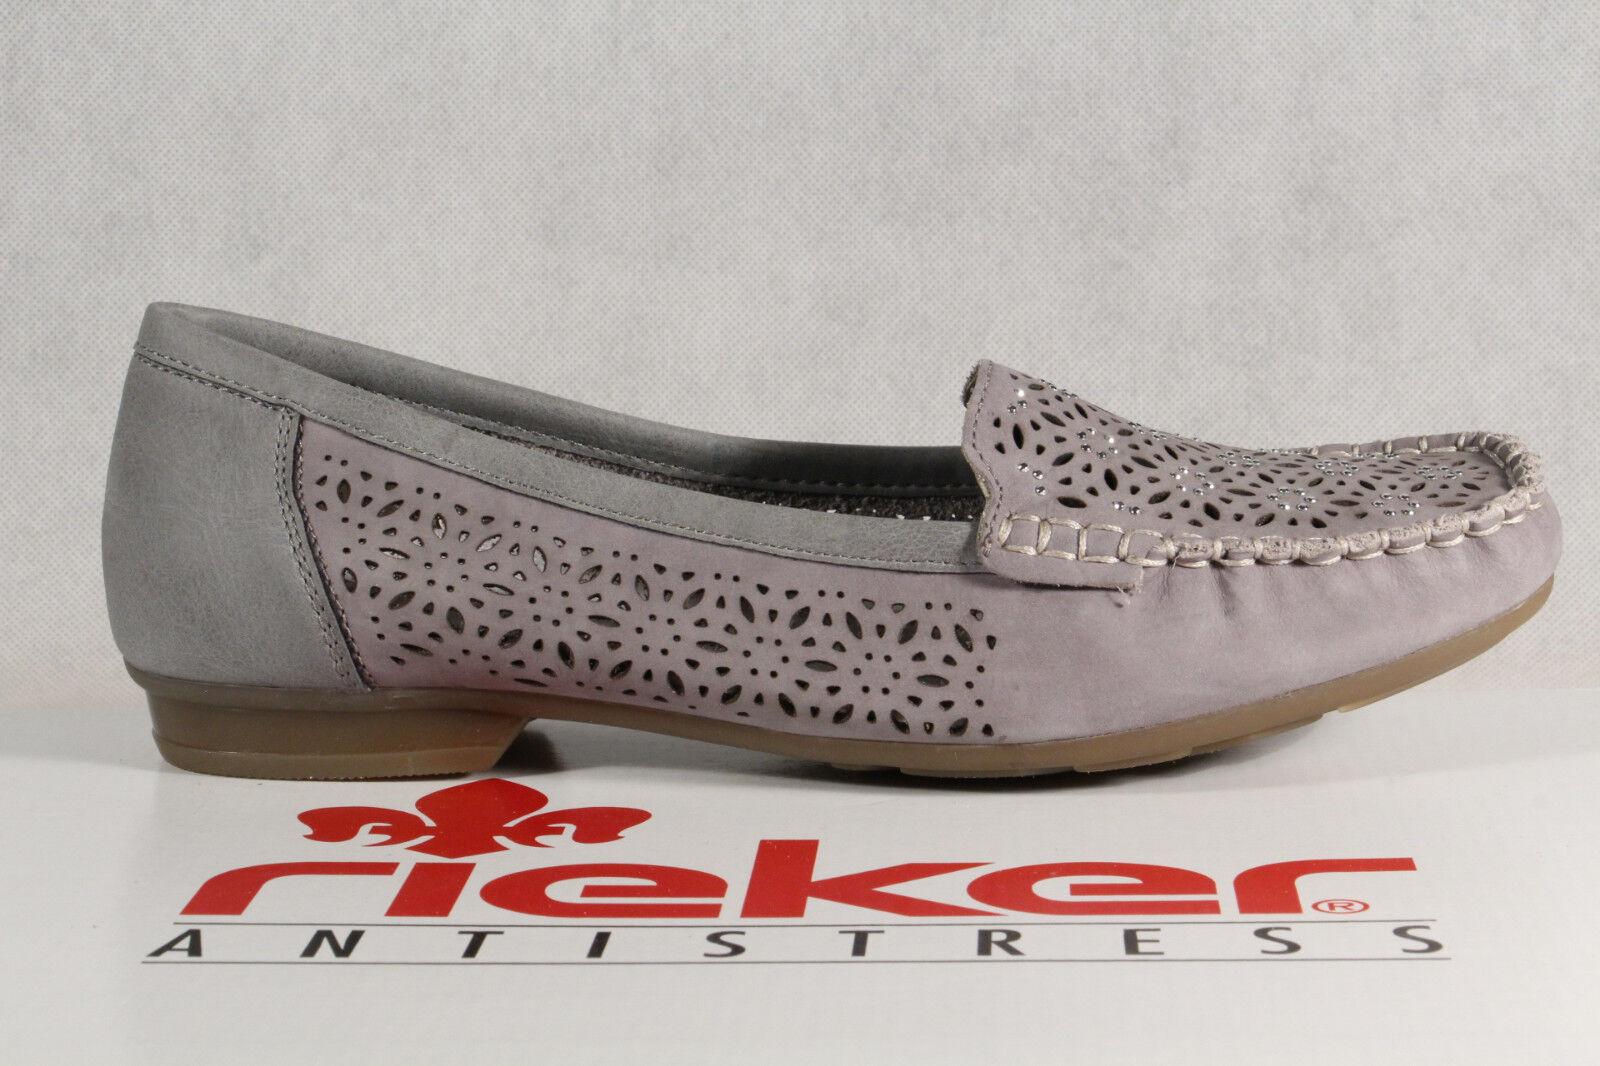 Rieker Slipper Sneakers 40075 Halbschuhe Sportschuhe Ballerina grau 40075 Sneakers   NEU 949c65